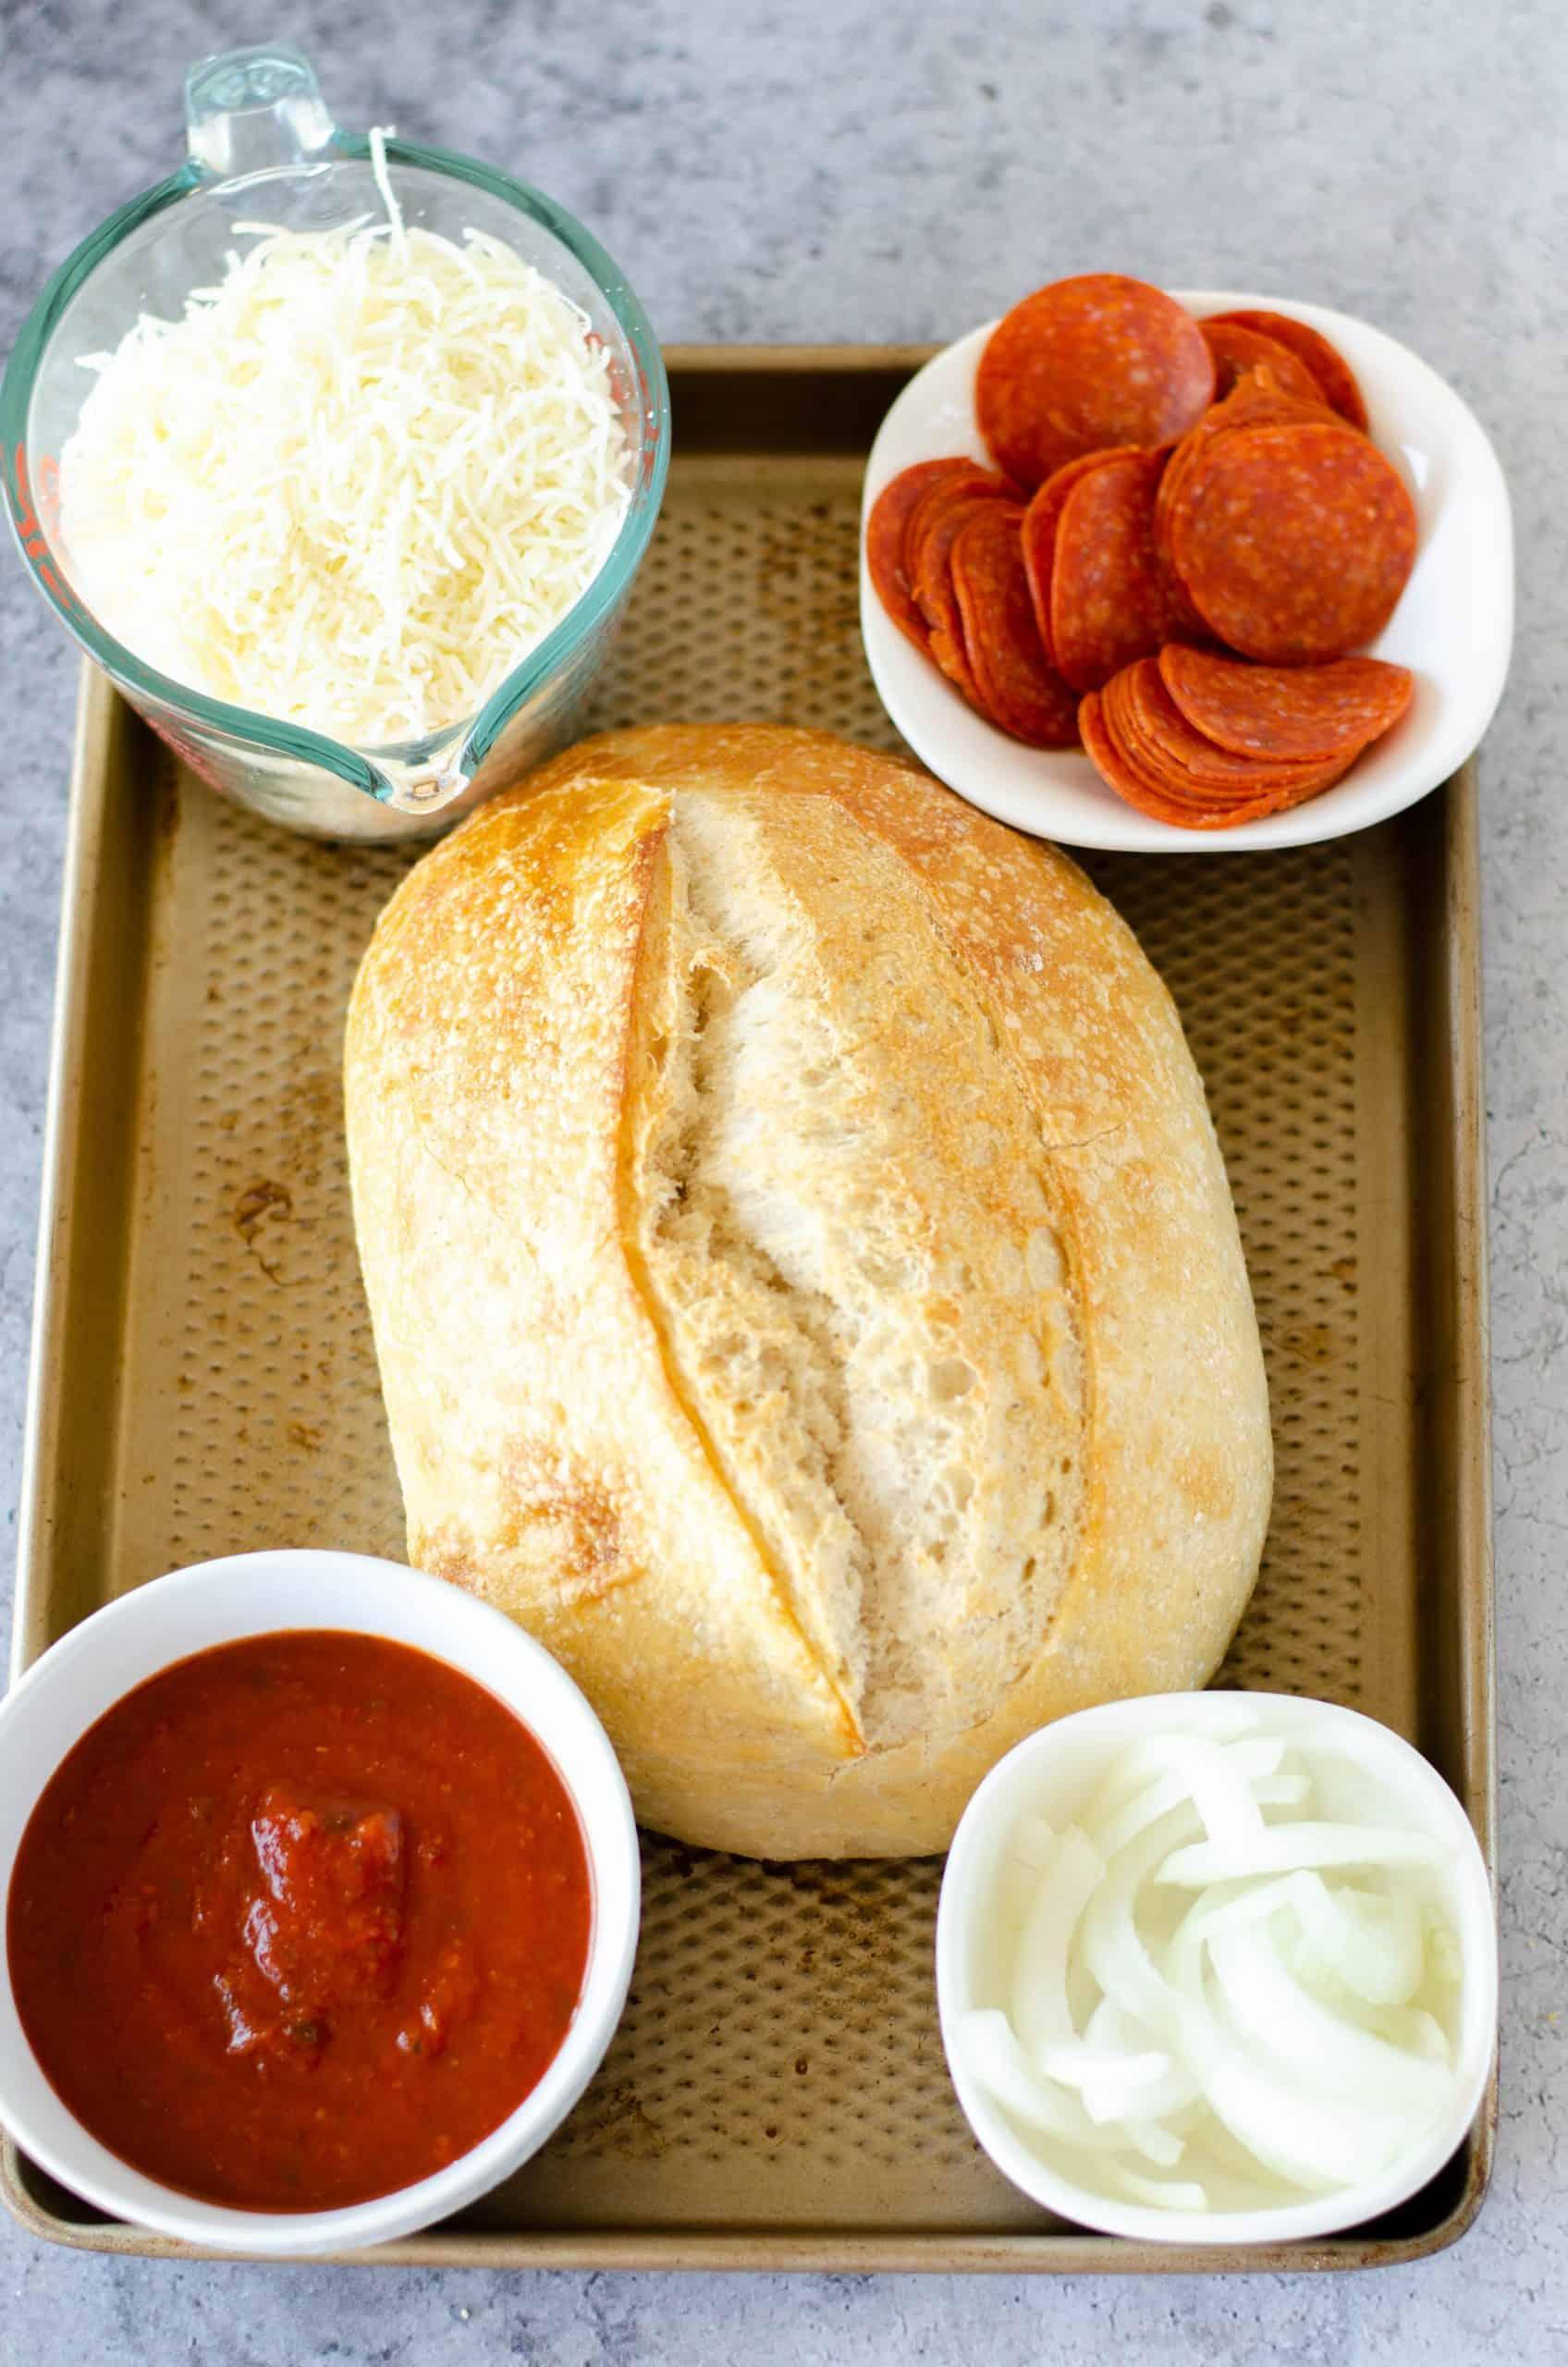 sourdough bread, pizza sauce, sliced pepperoni, sliced onion, shredded mozzarella cheese.